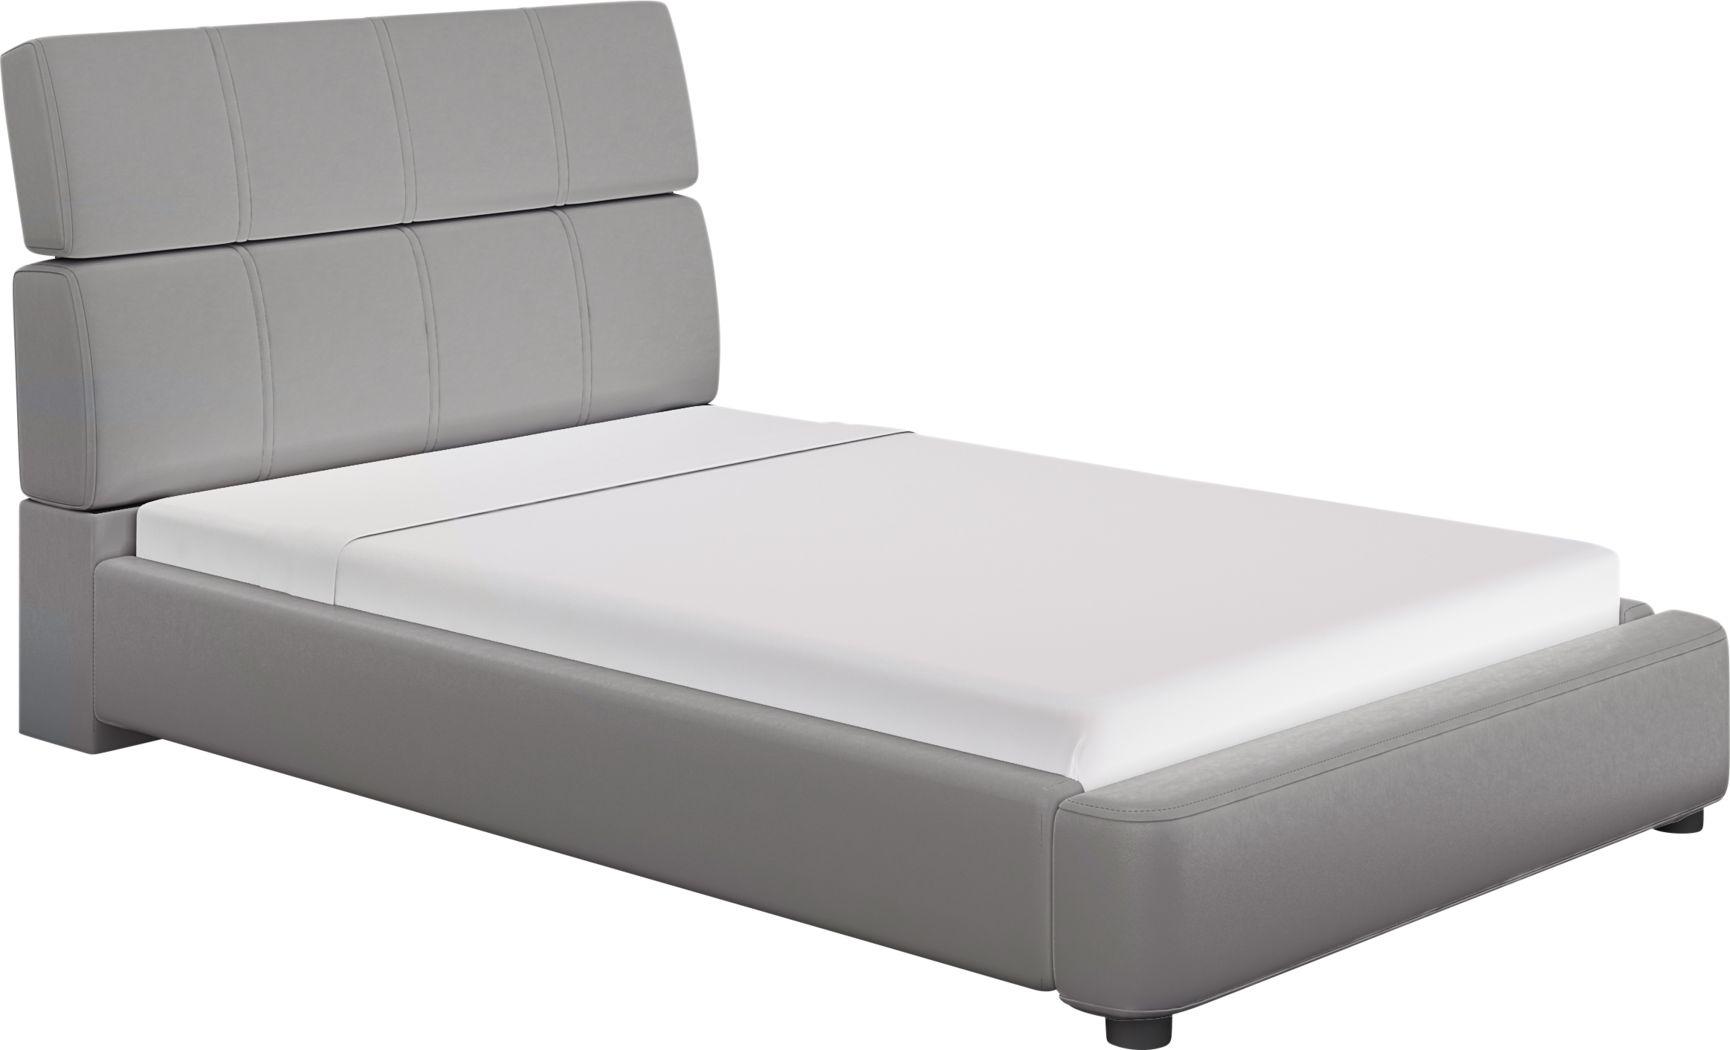 Kids reGen™ Recharged Gray 3 Pc Full Bed